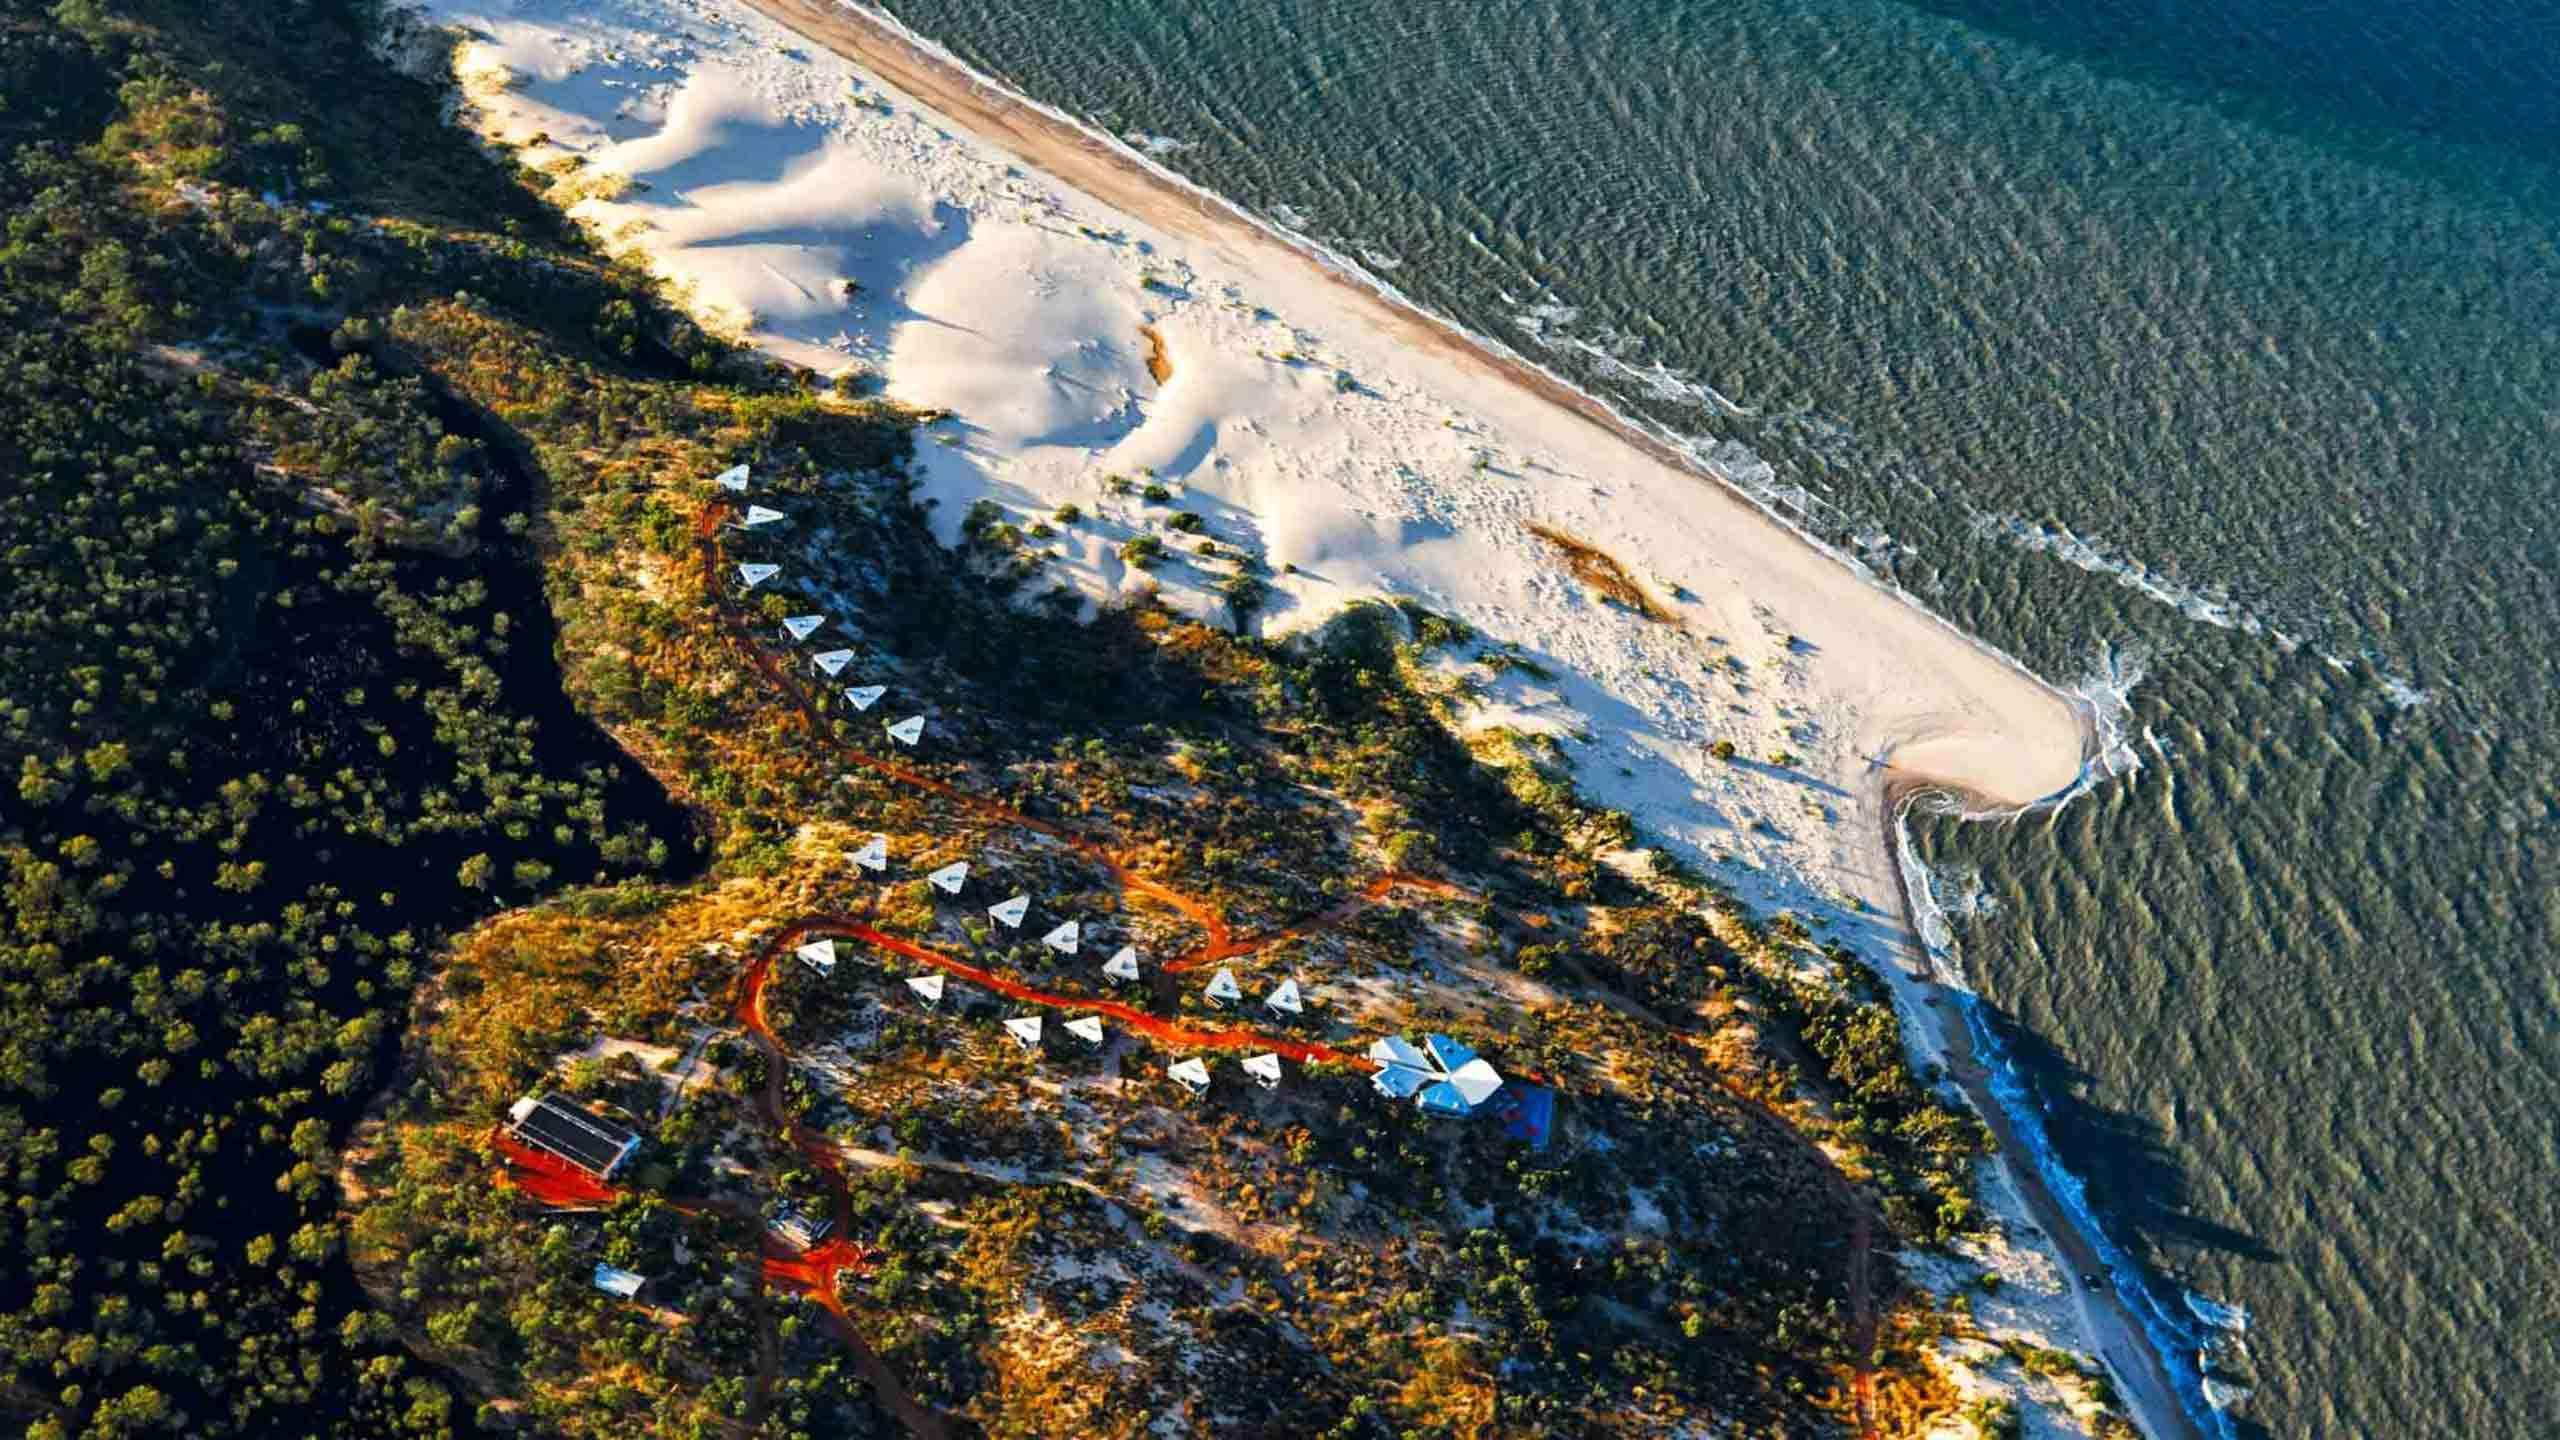 The Ultimate Luxury Far North Kimberley Coast Cruise & Walk 6D5N + Berkeley River Lodge